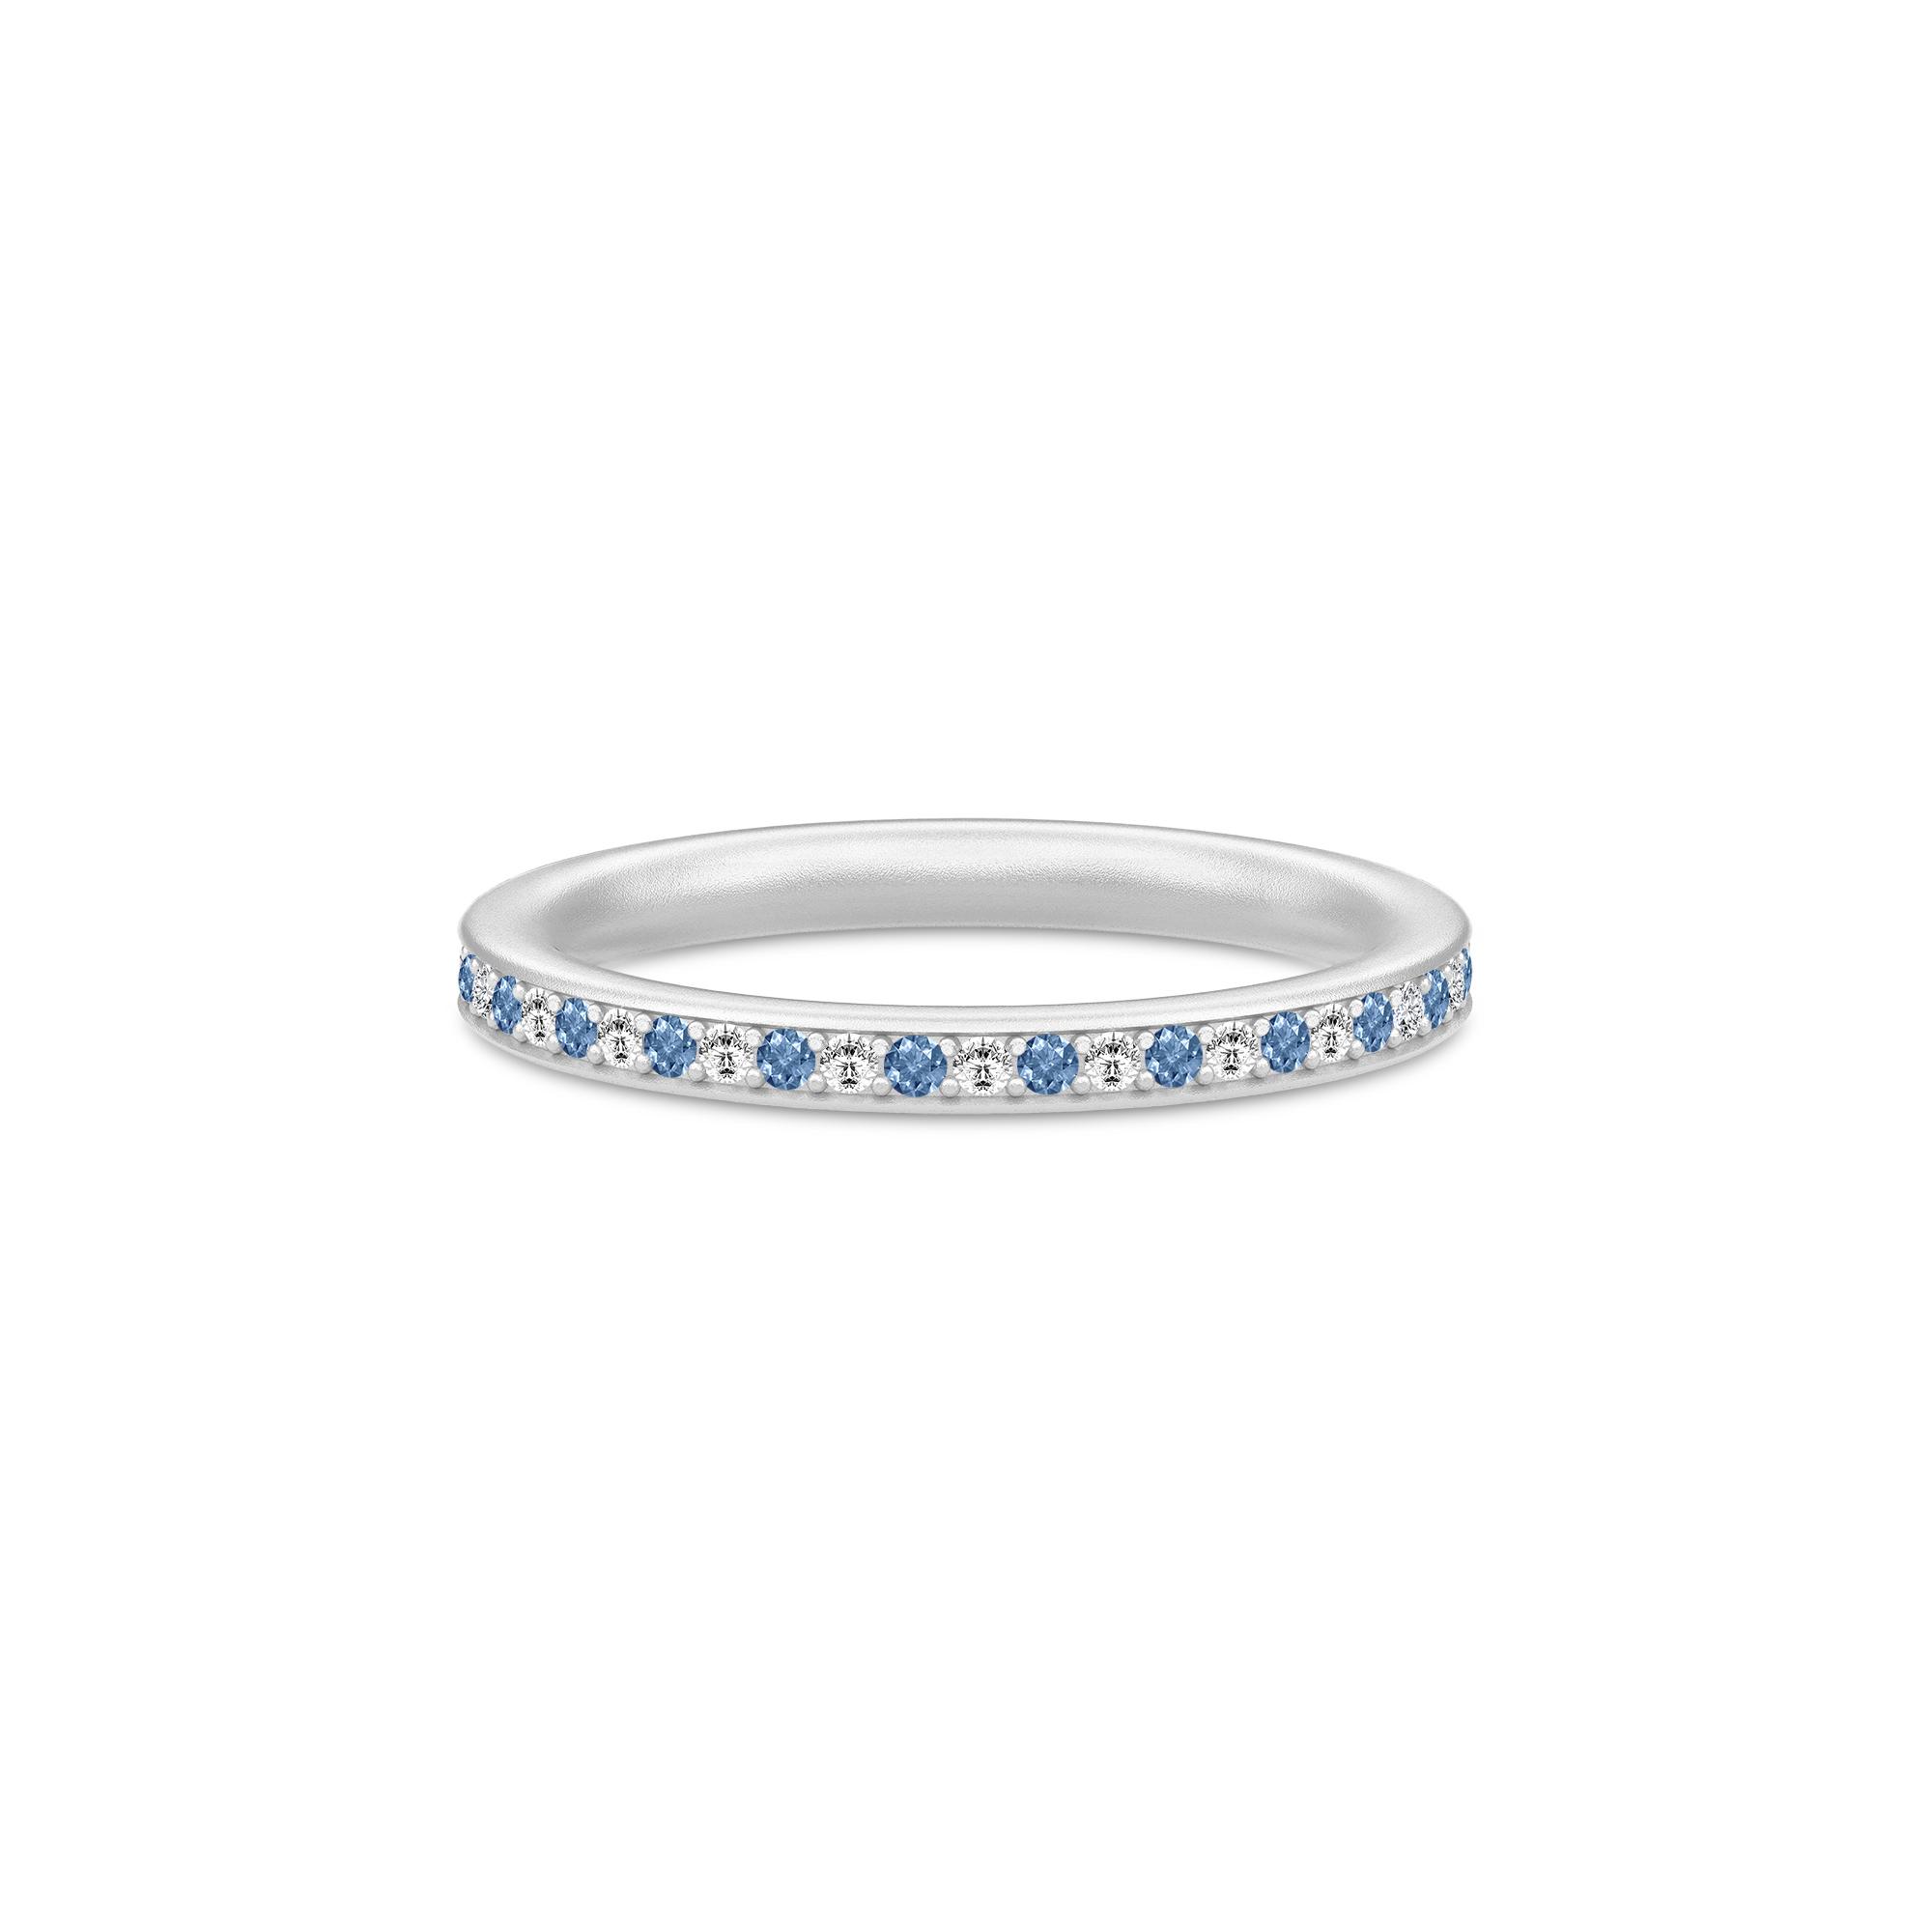 Julie Sandlau Infinity ring i sølv med blå cz